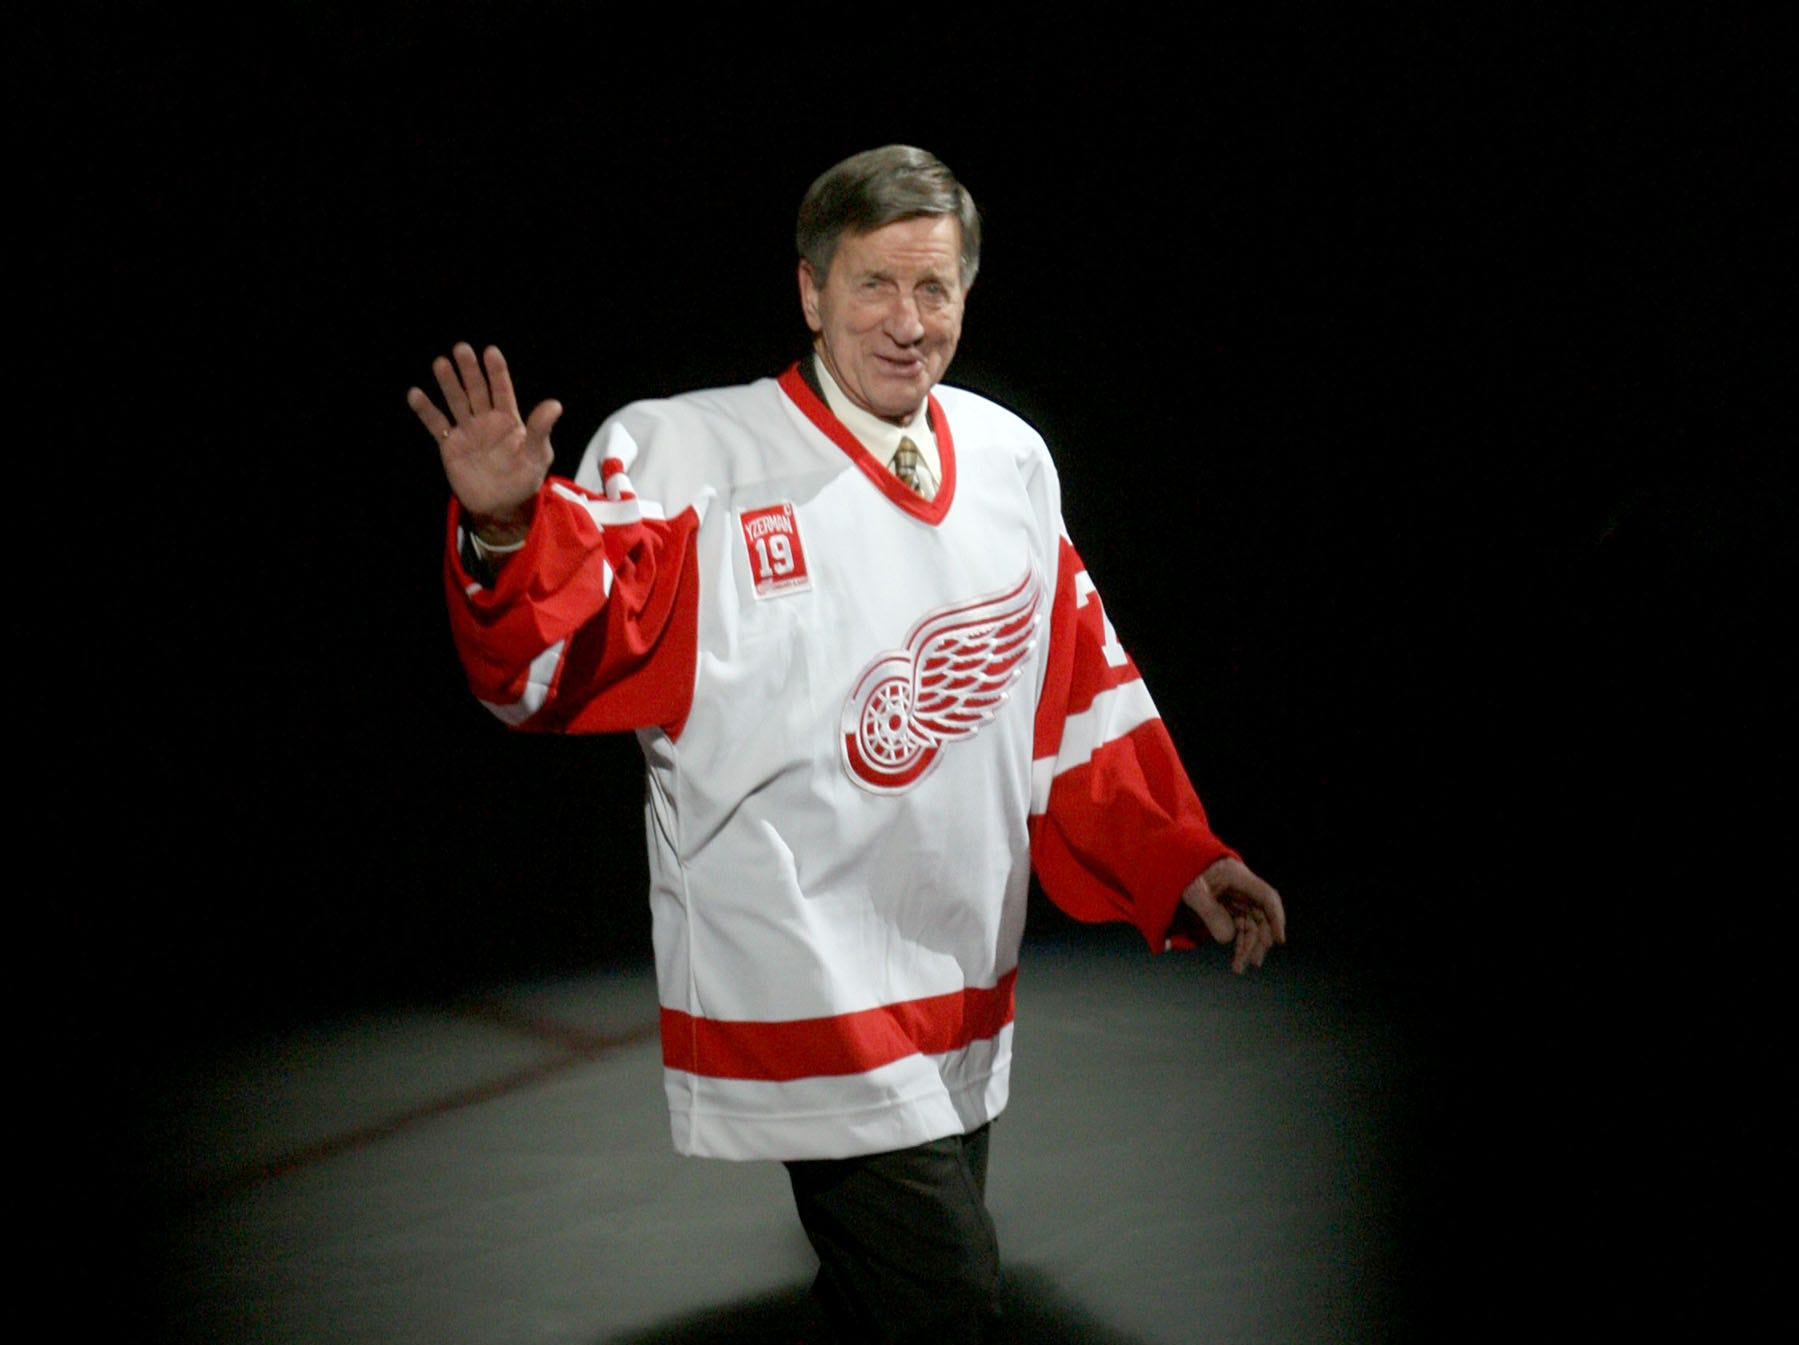 Detroit Red Wings legend donates $1M to Oakland University